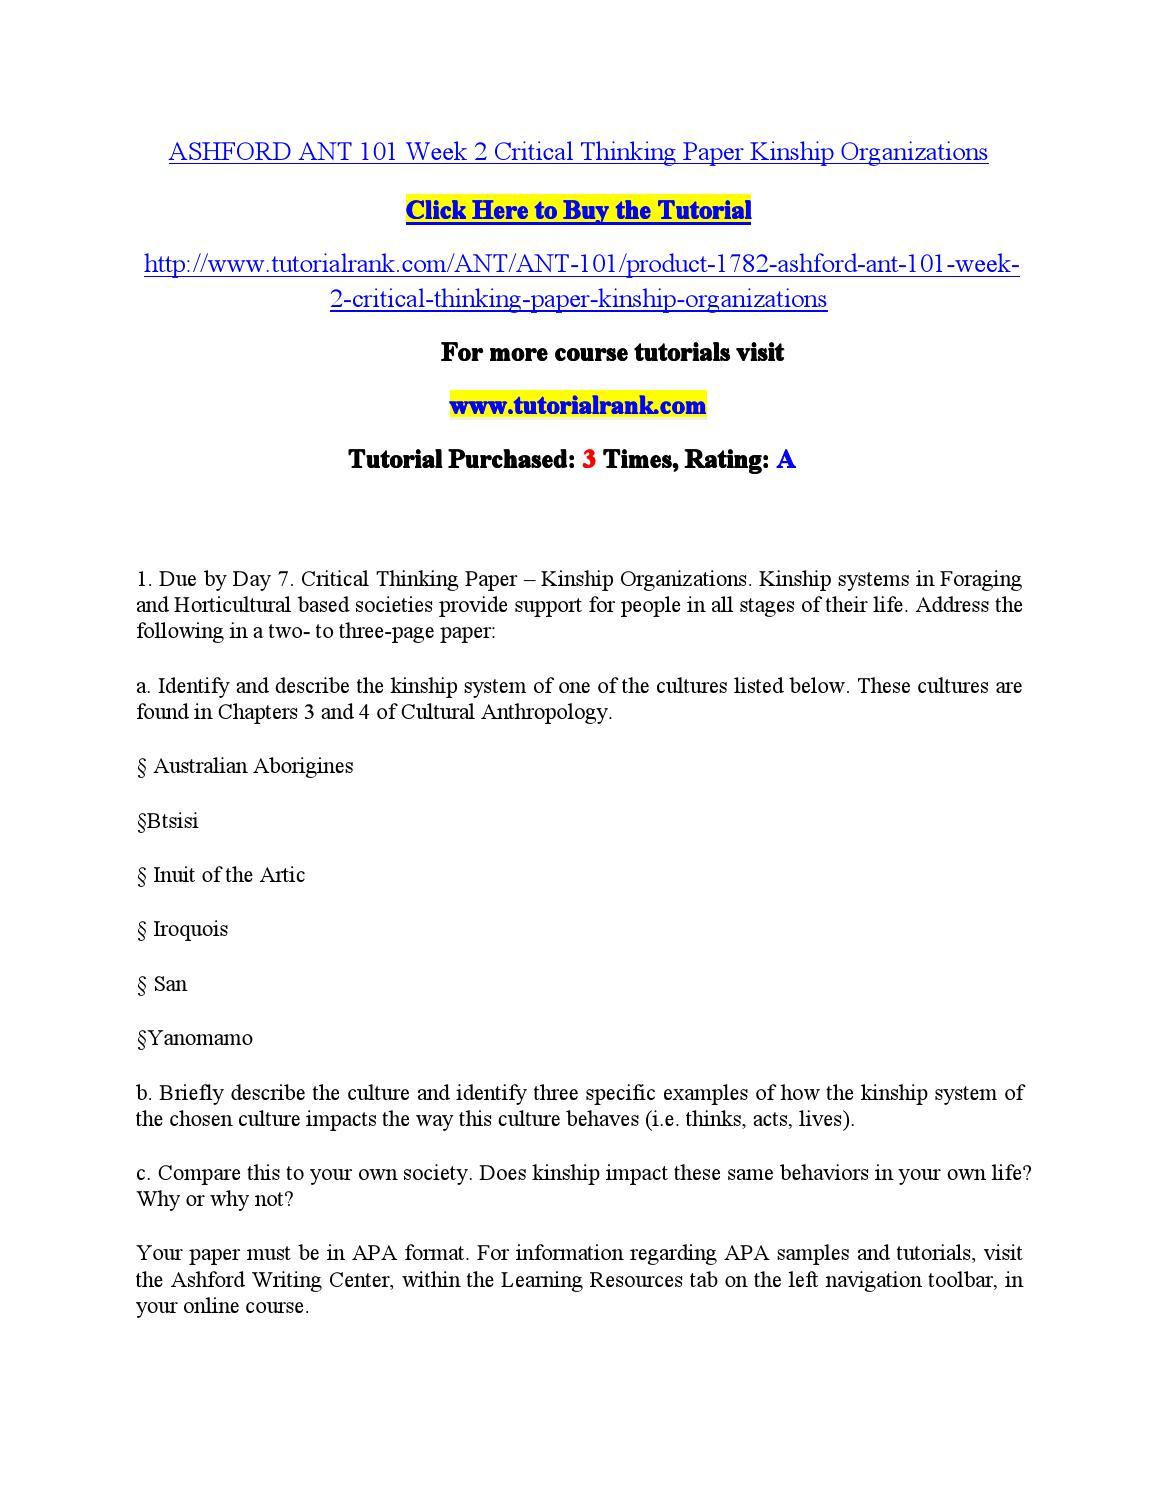 Graduate school essay writing service